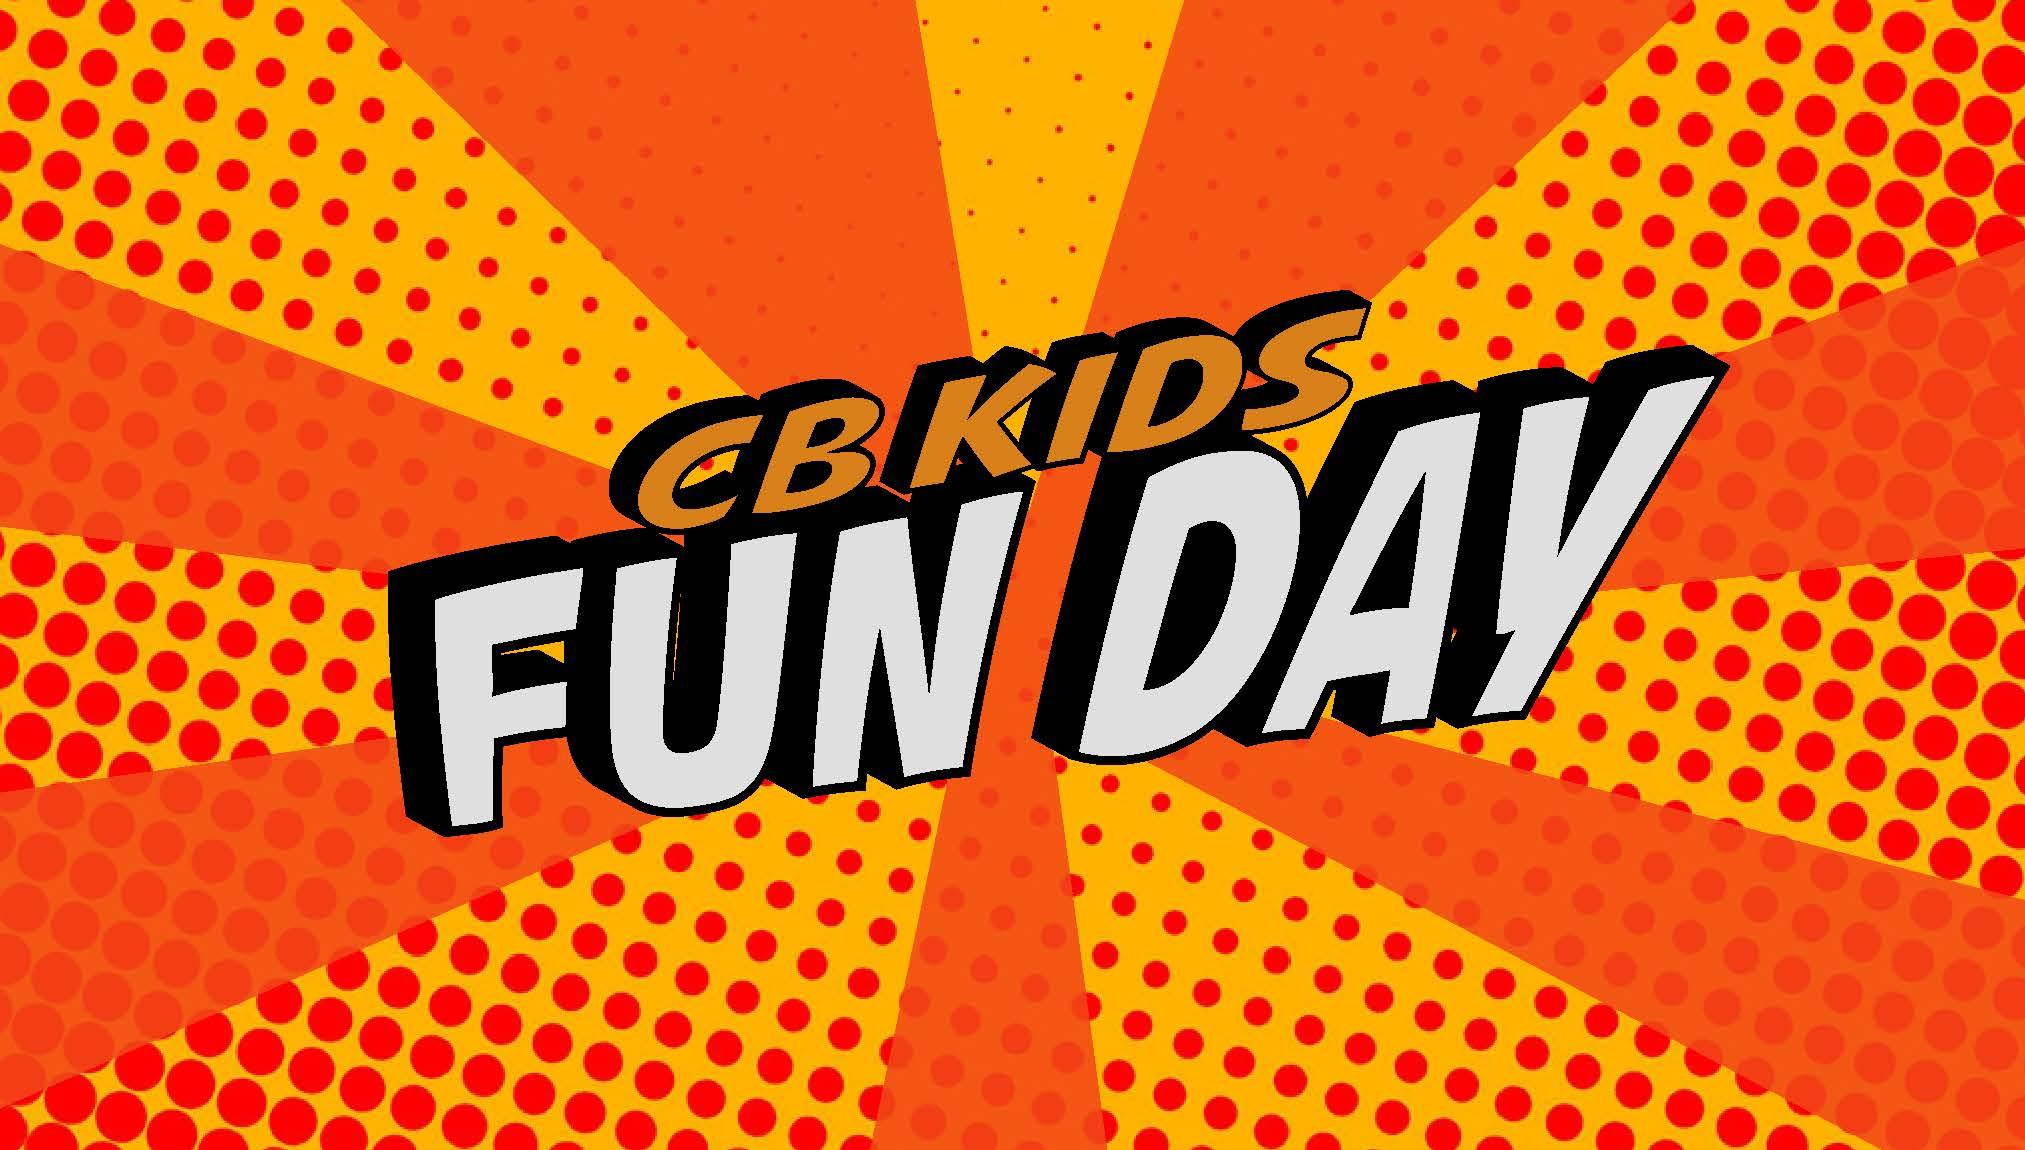 cbkids_fun_day (1)